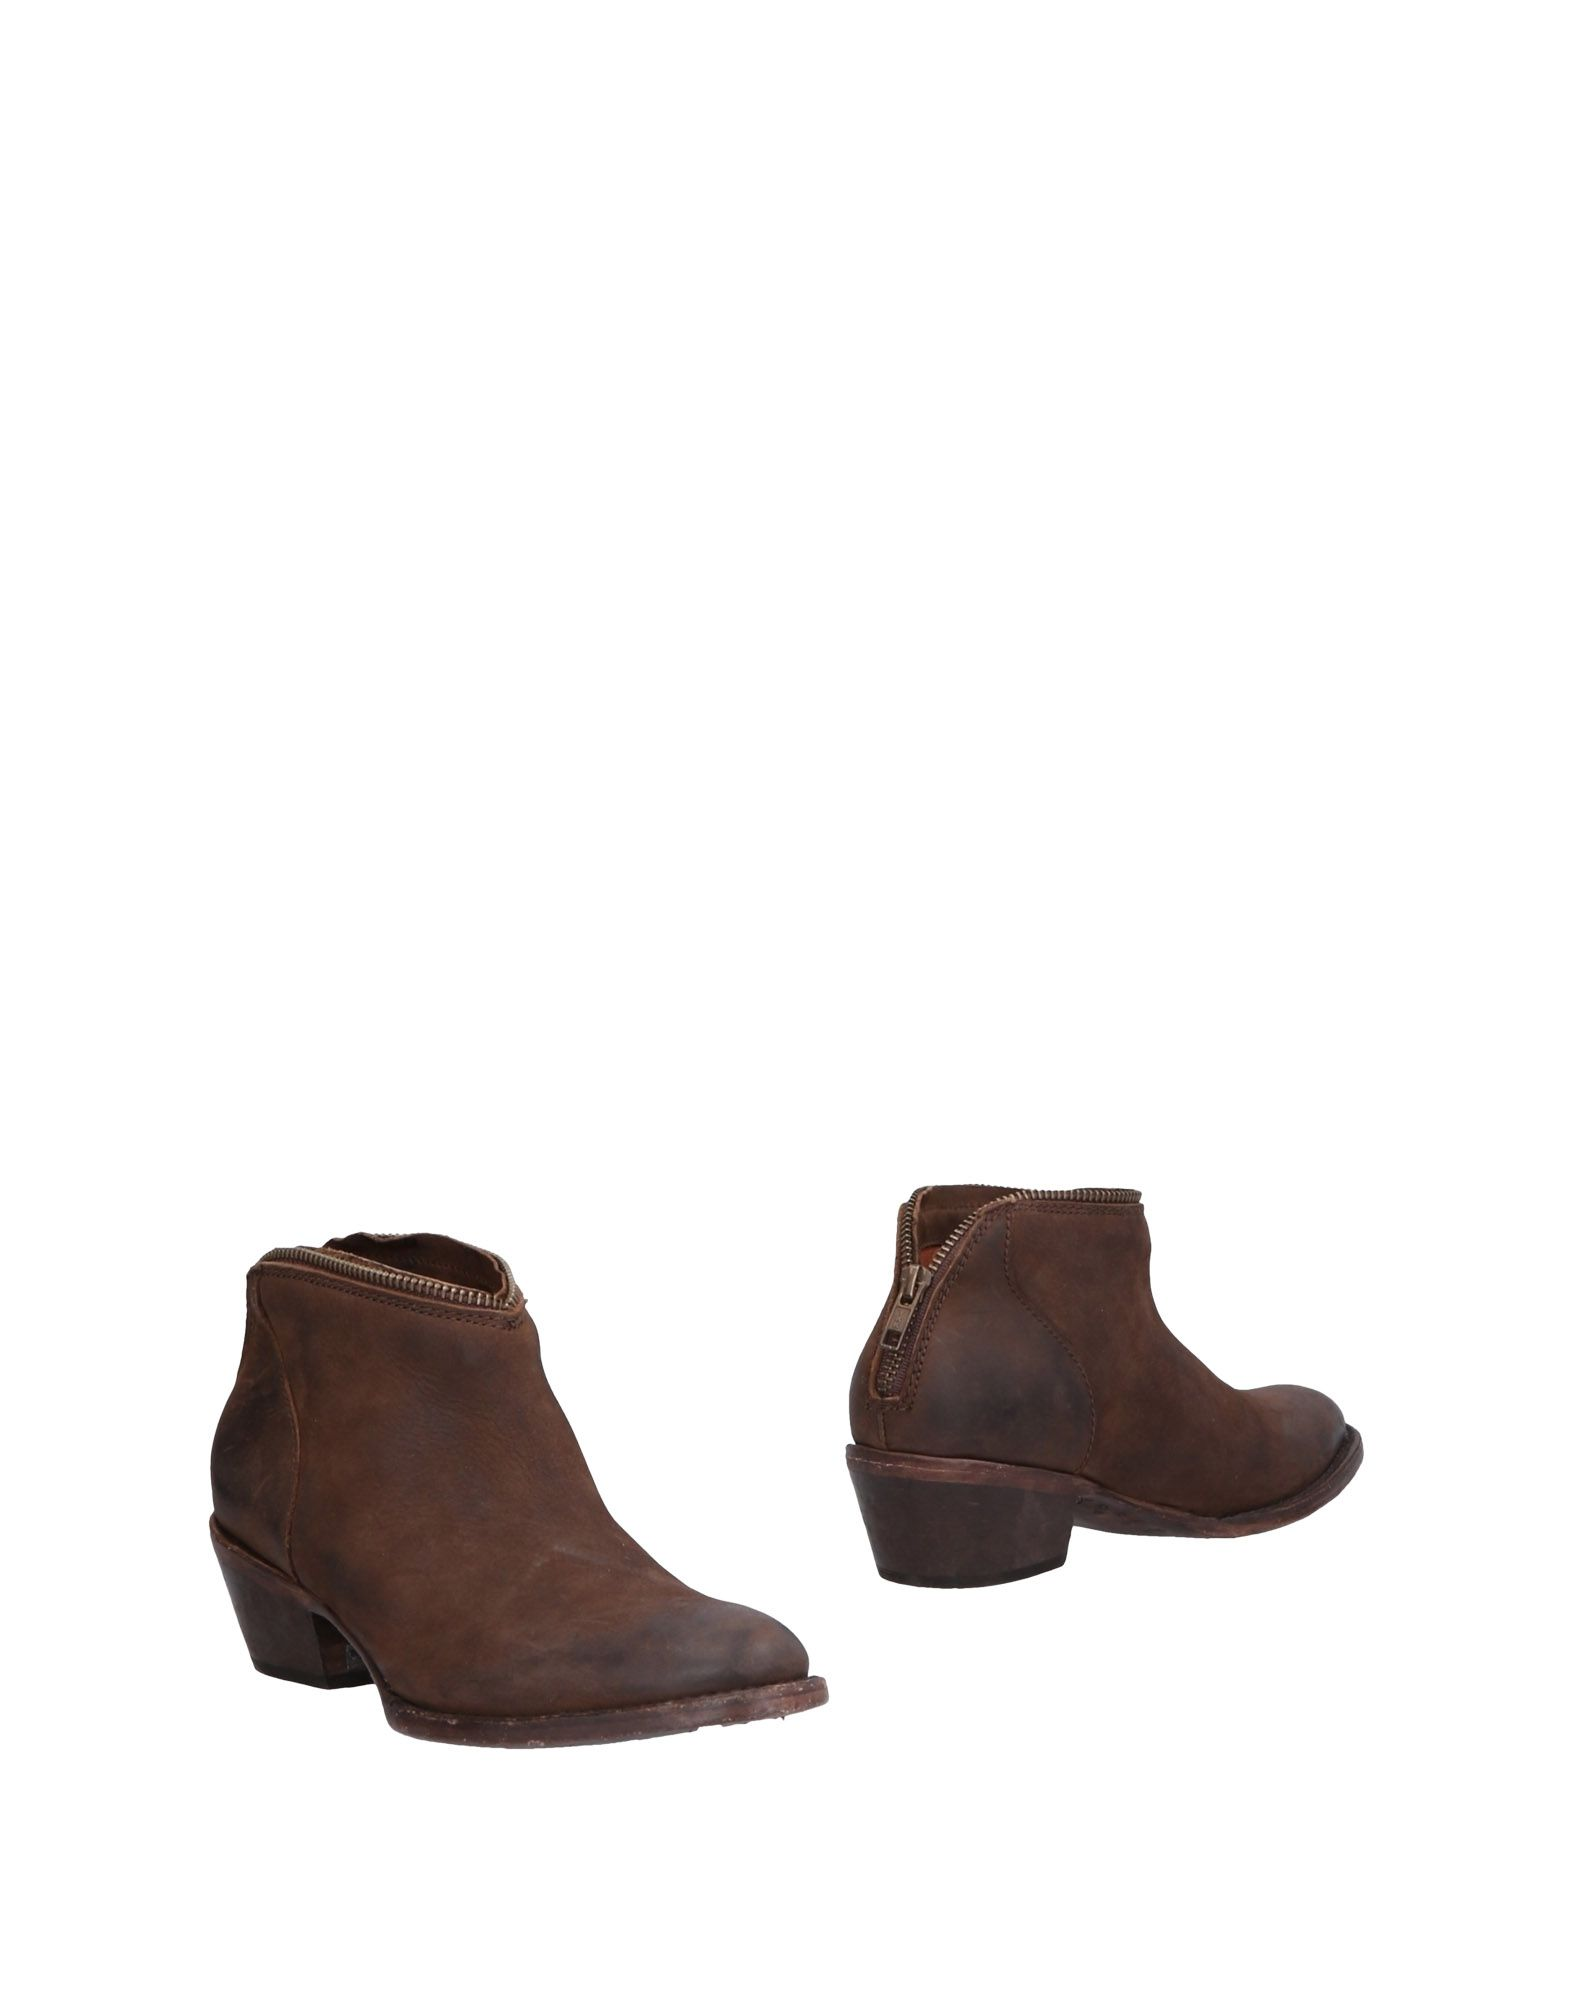 Mezcalero Ankle Boot - Women Mezcalero Ankle Canada Boots online on  Canada Ankle - 11467243HM 6fa185